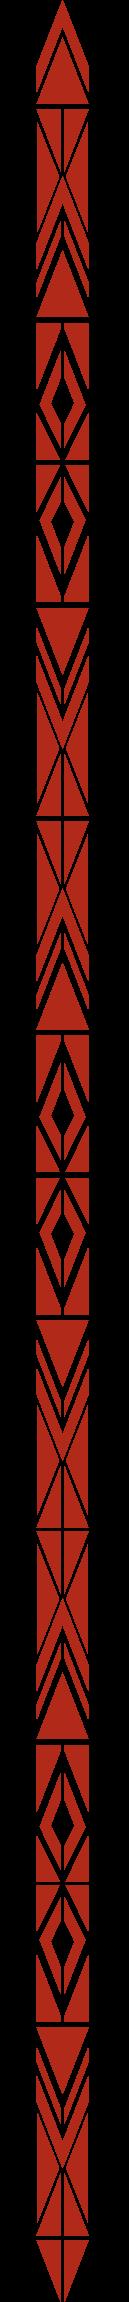 RT-divider-aztec-pole.png